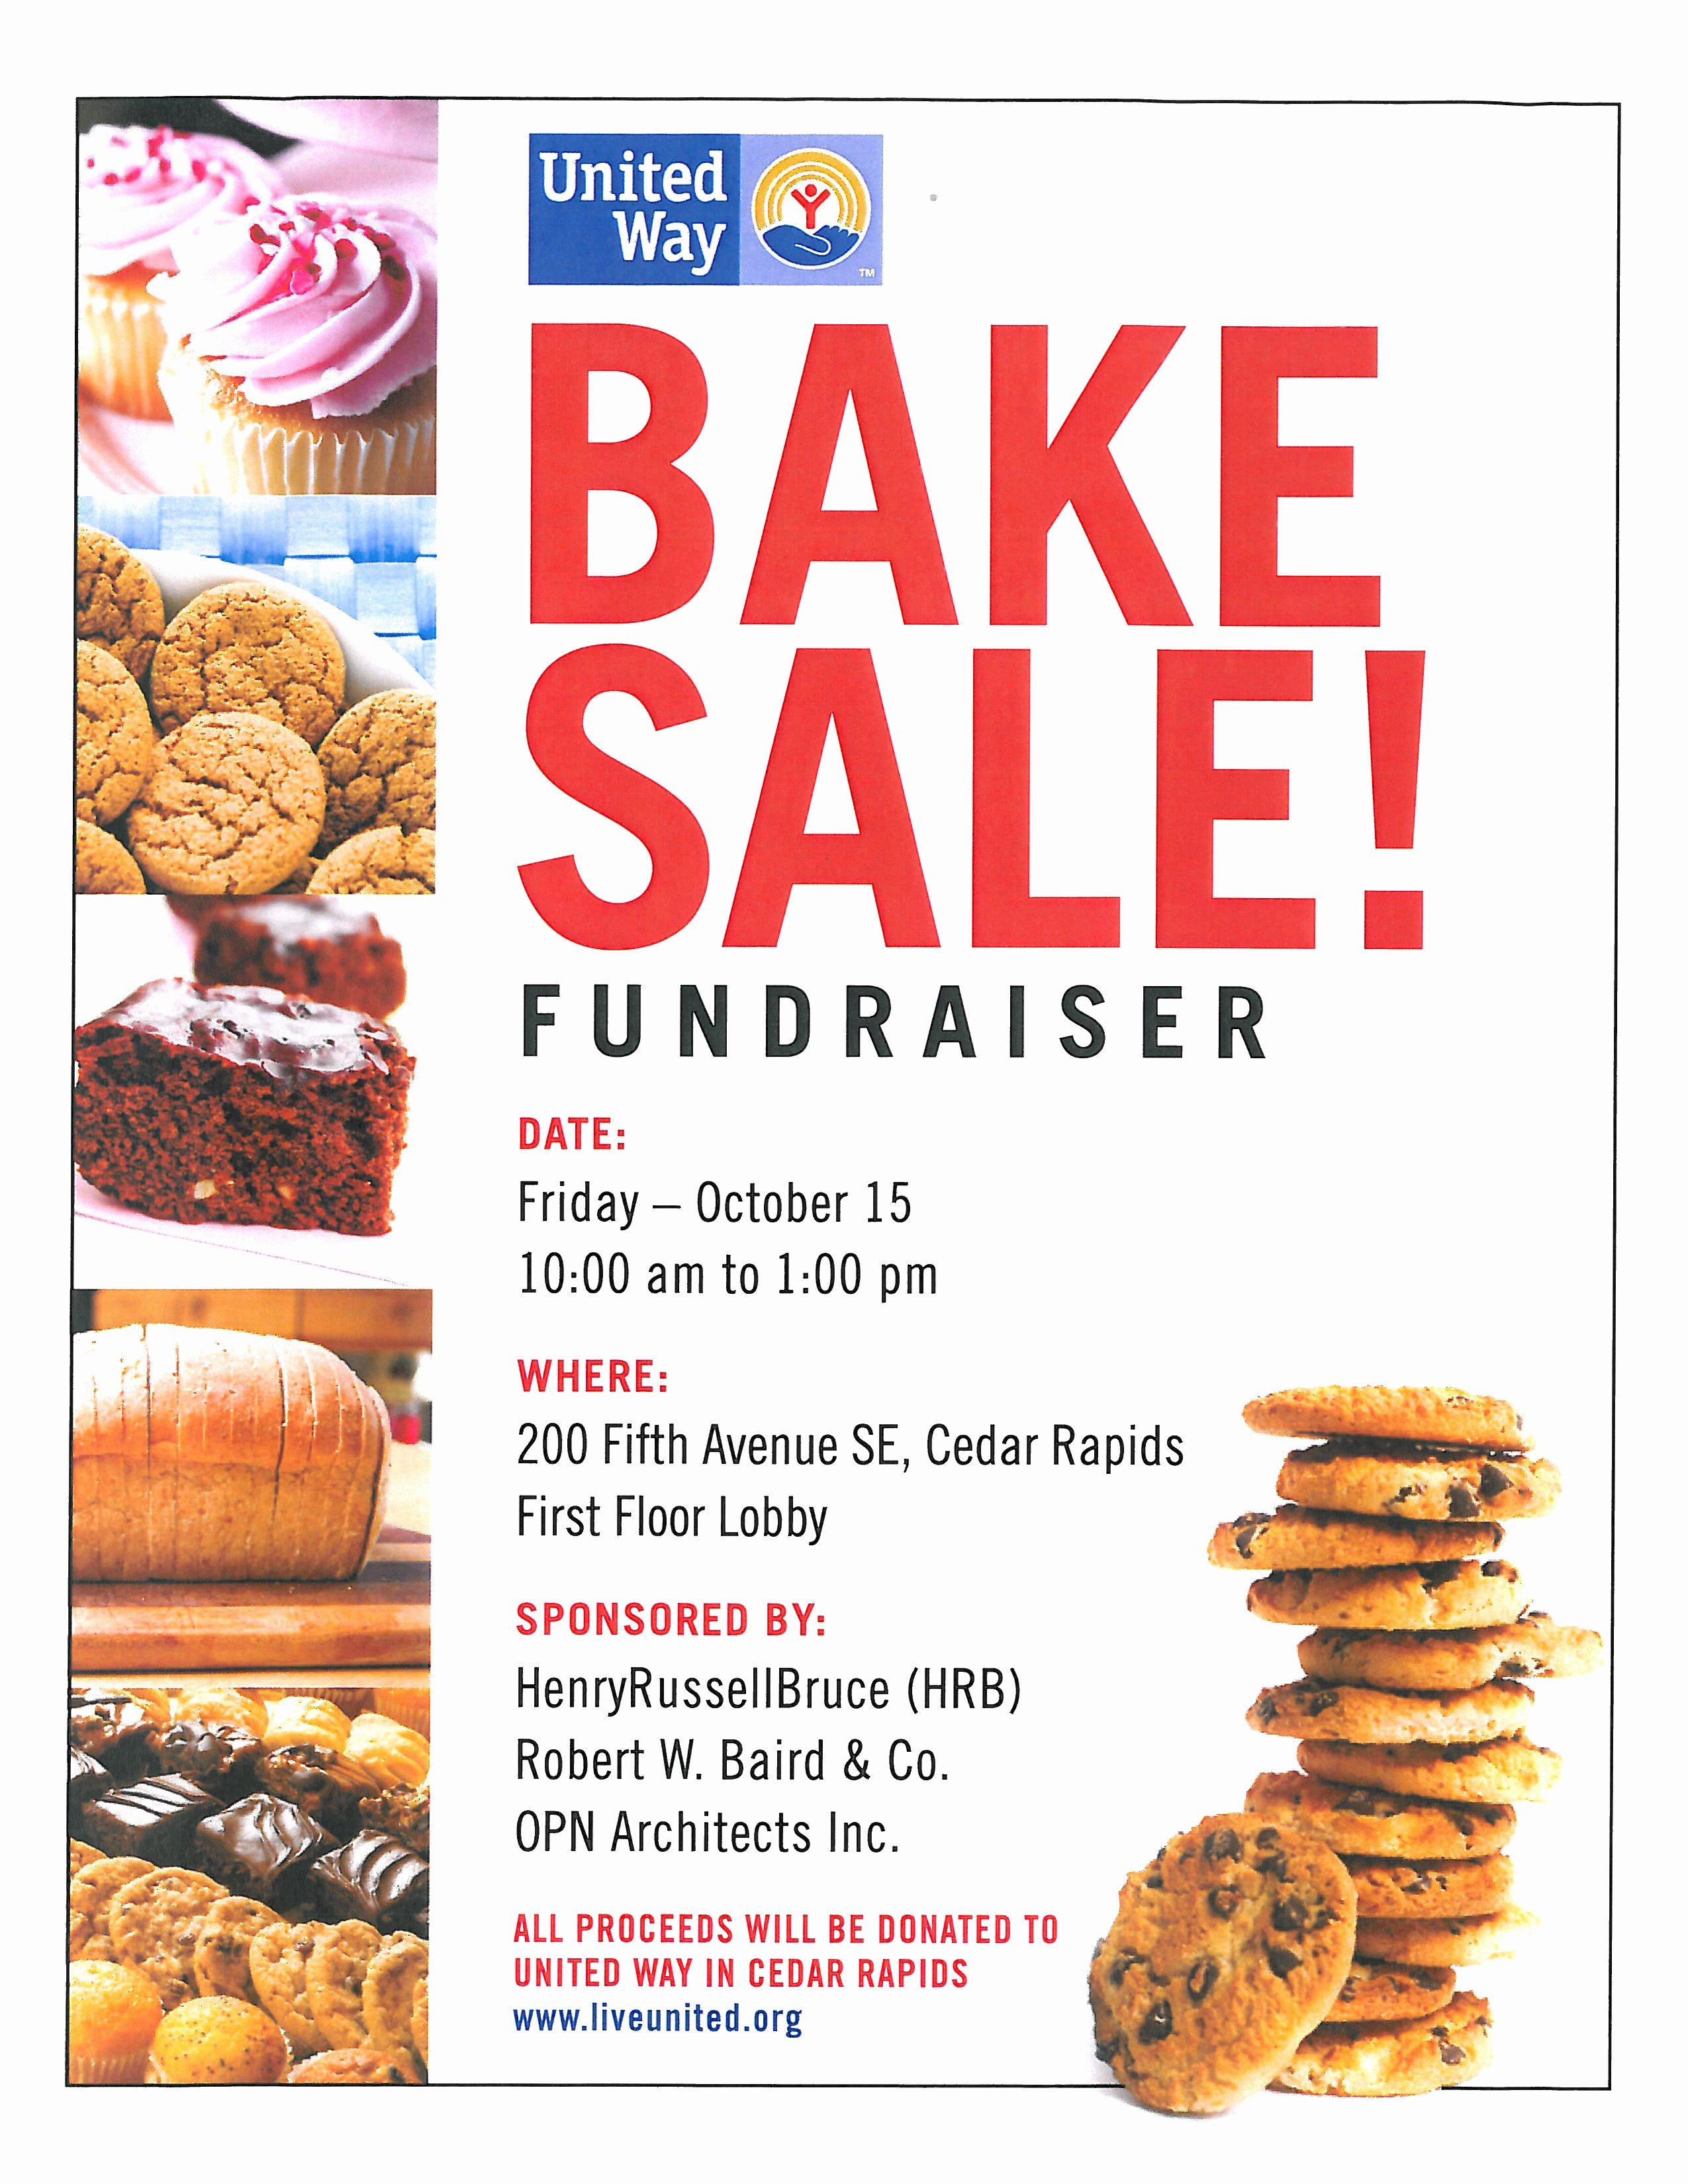 Bake Sale Fundraiser Flyer Template Elegant Word Design Gallery Category Page 12 Designtos